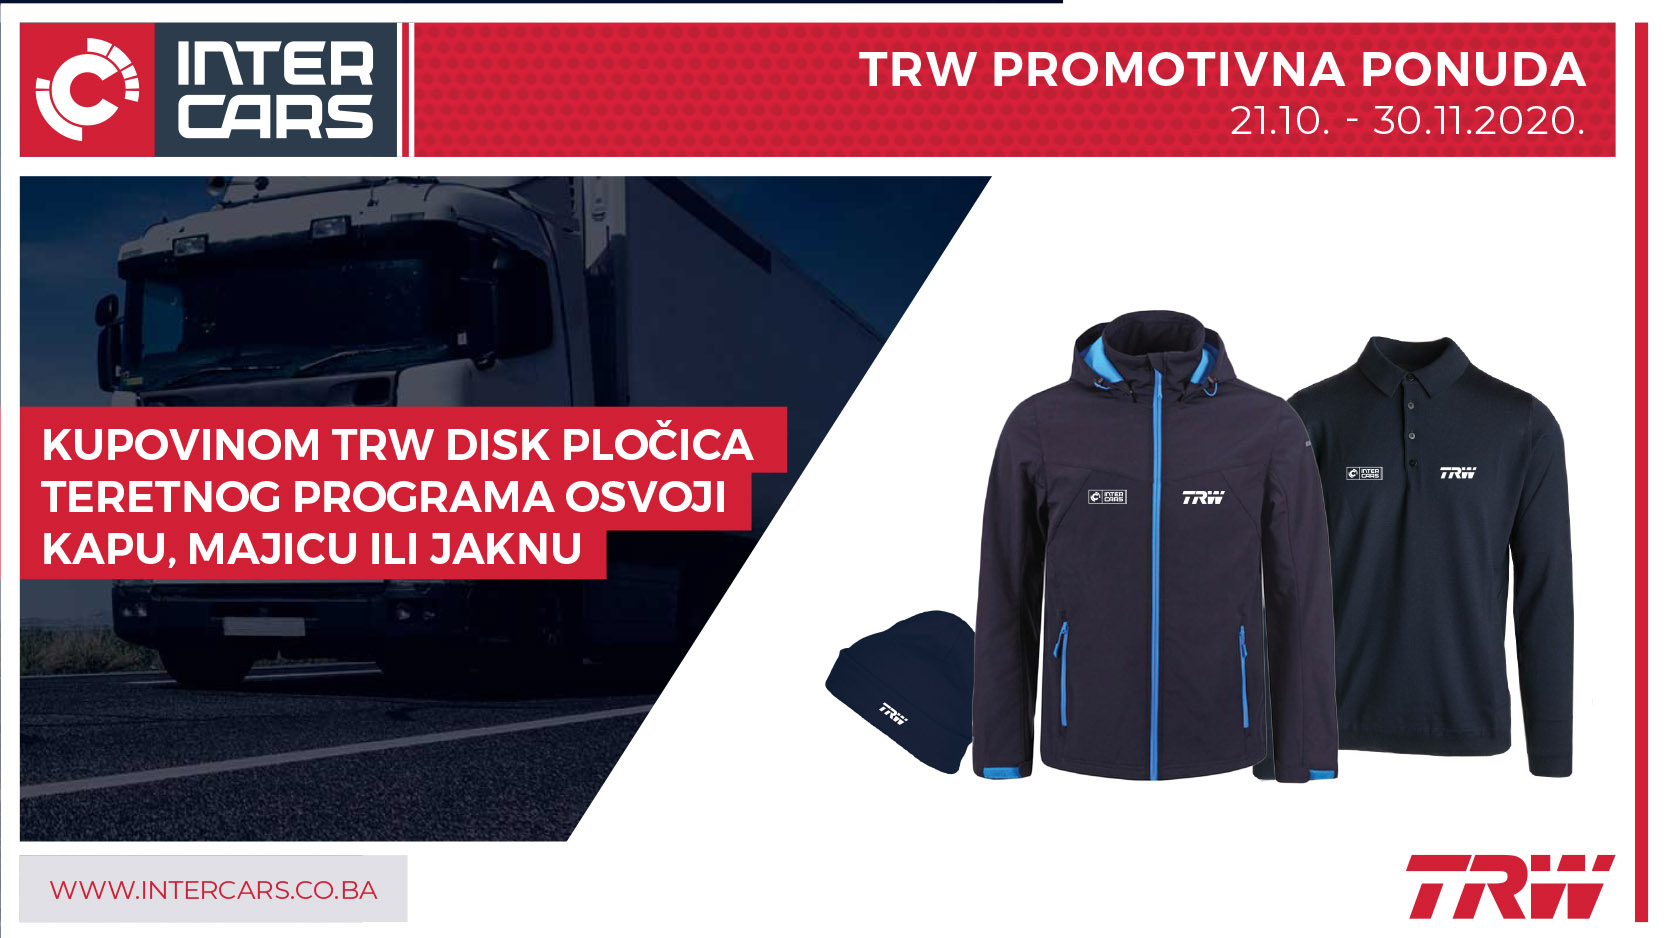 TRW BANNER 800X400 akcija inter cars promocija.jpg